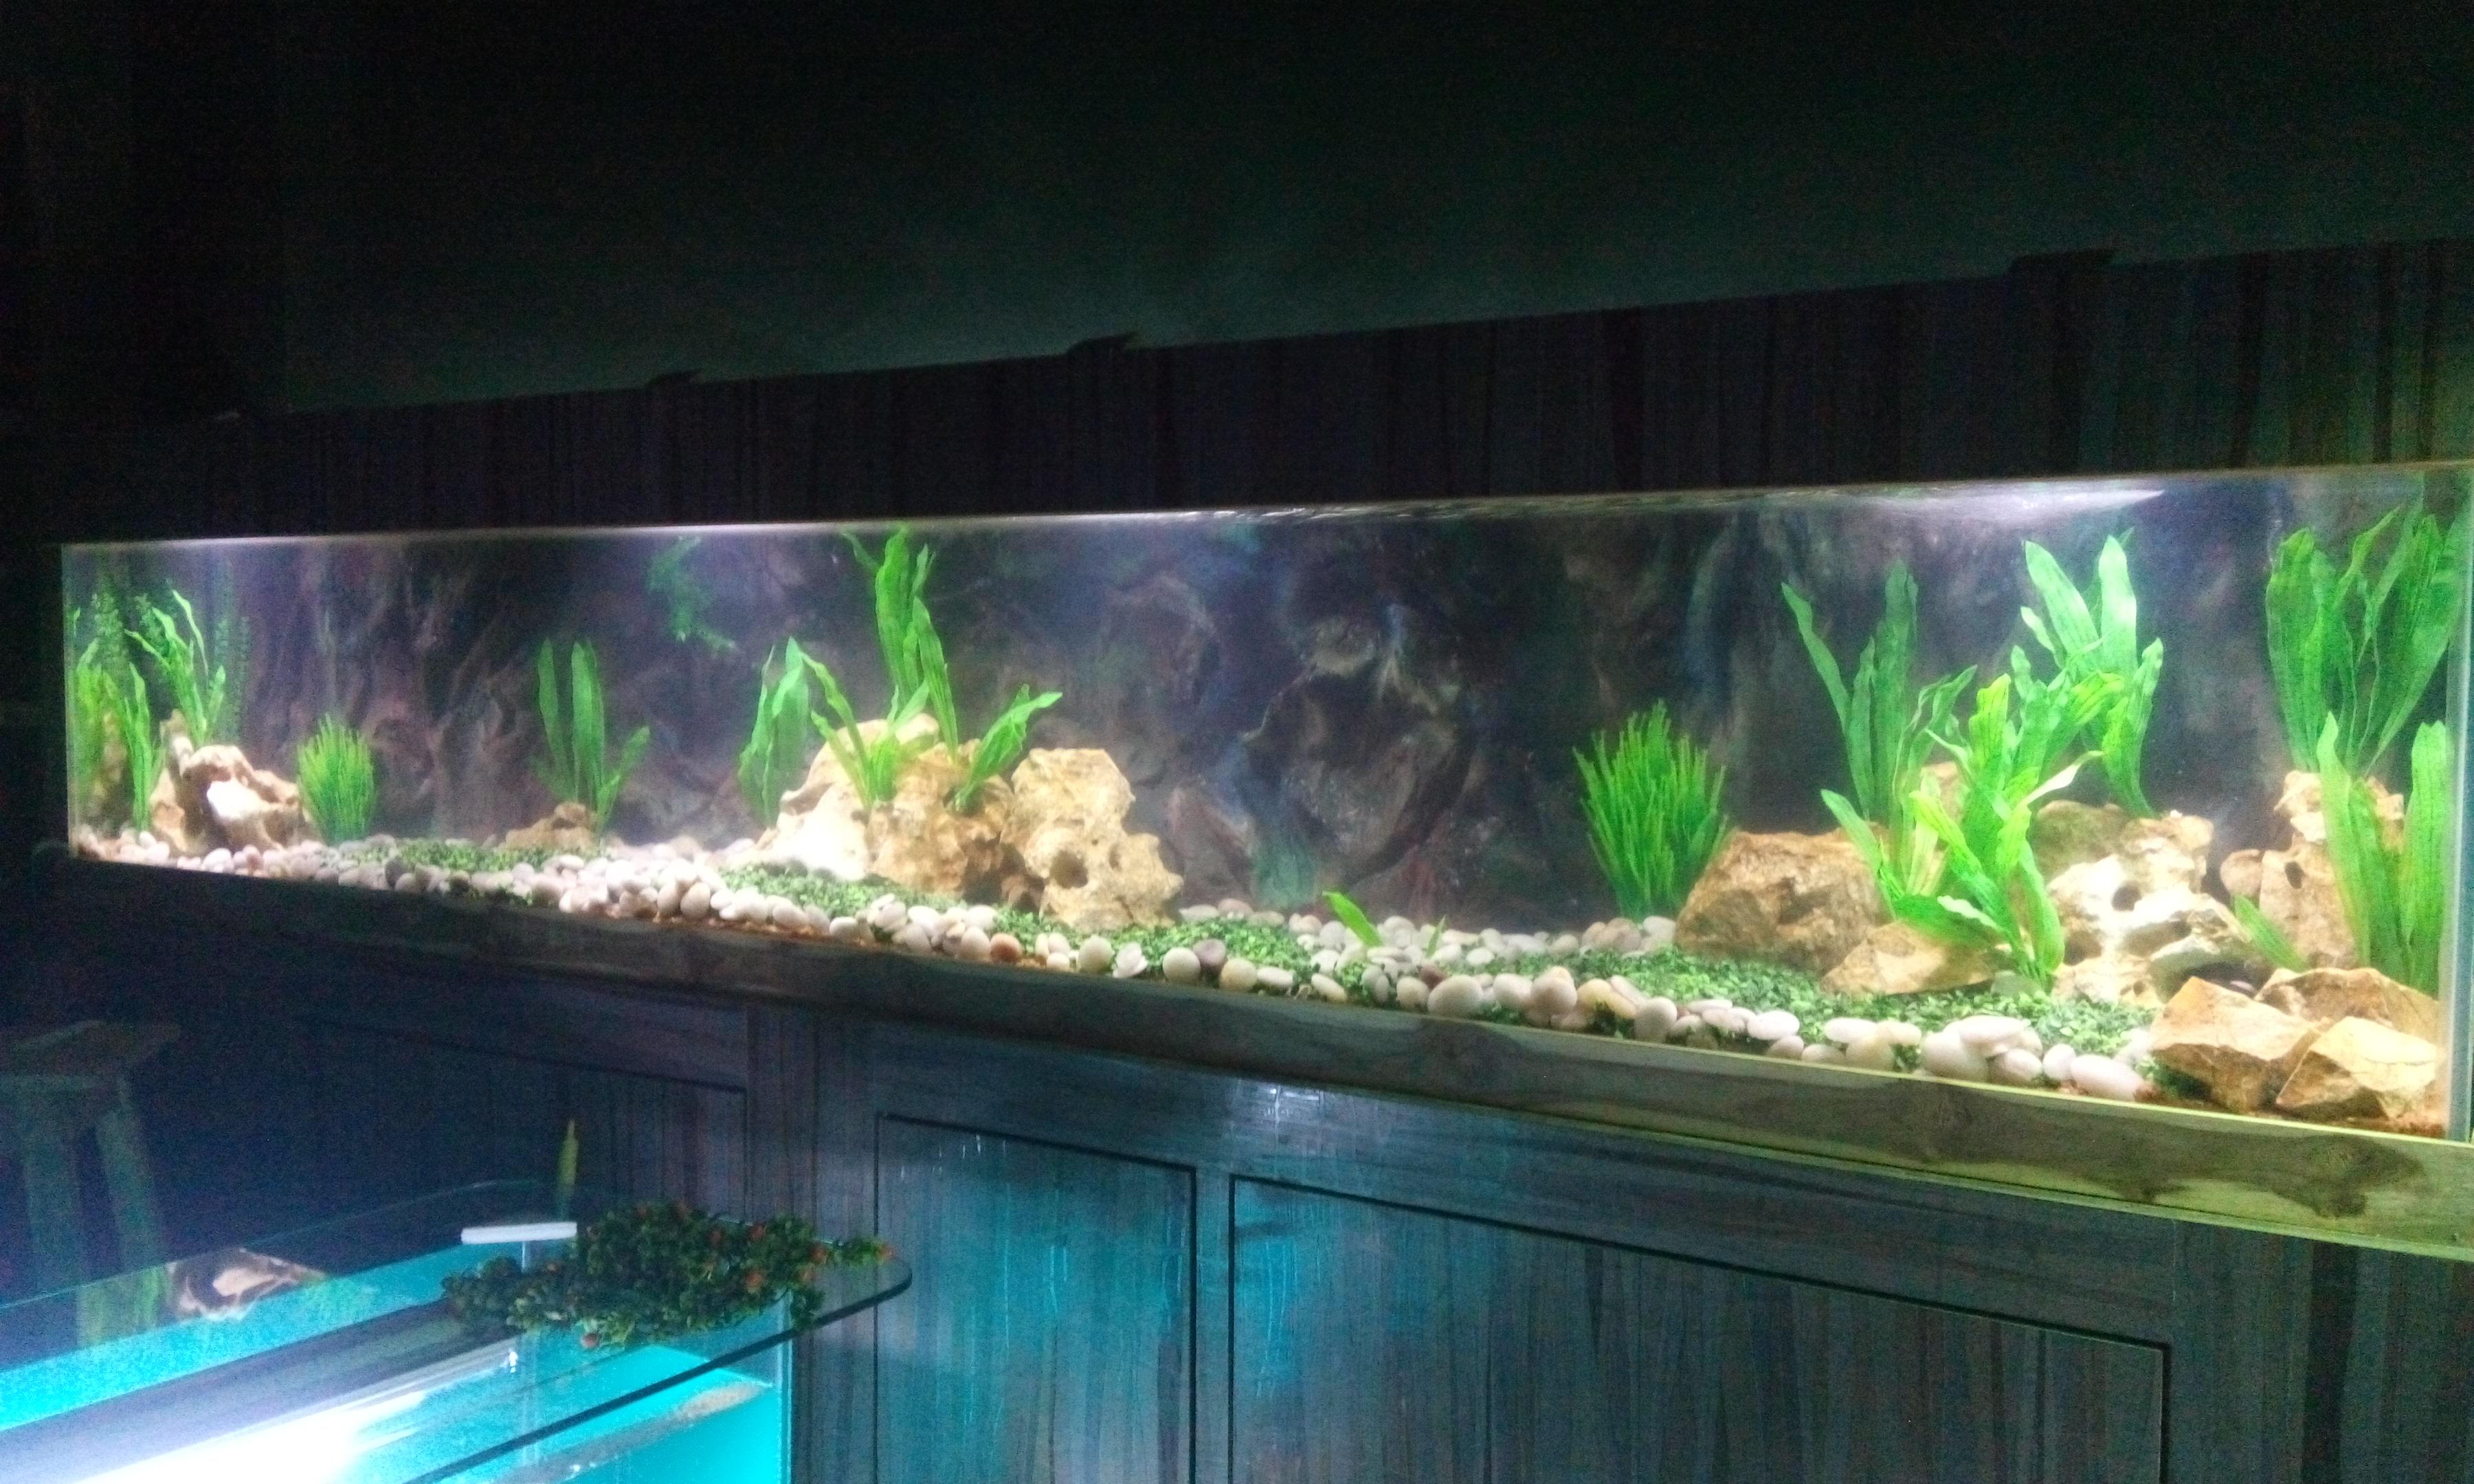 Hi, This is a leading aquarium company